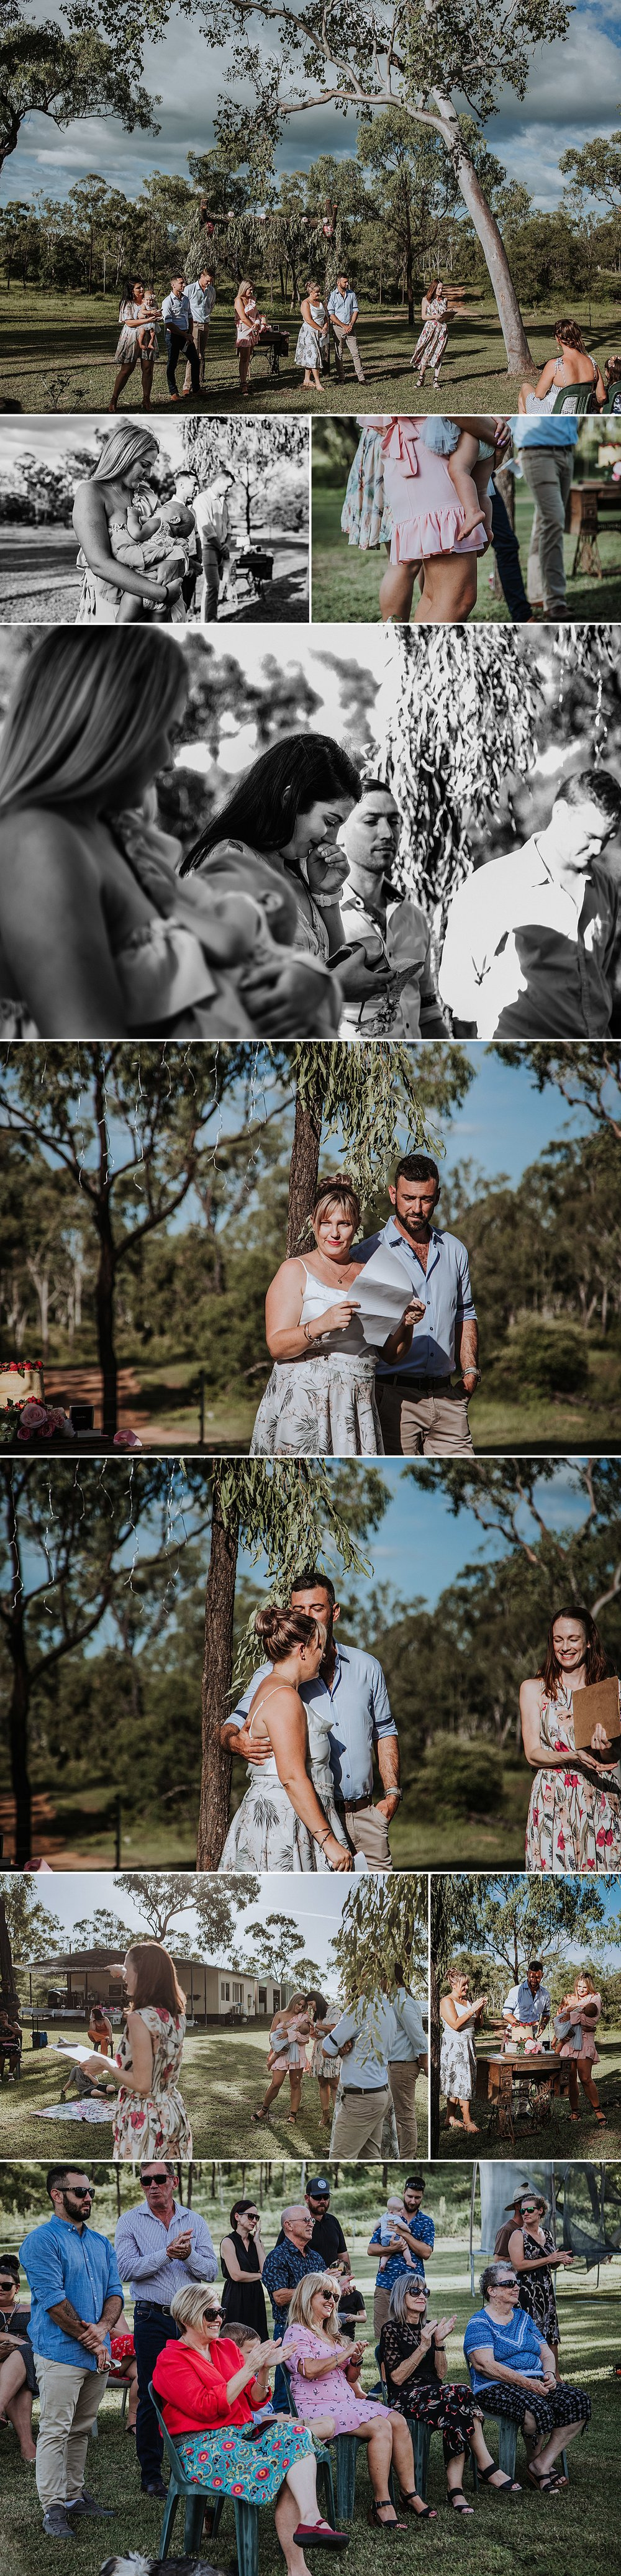 Outdoor-name-celebration-baby-christening-documentary photographer-Townsville-Burdekin